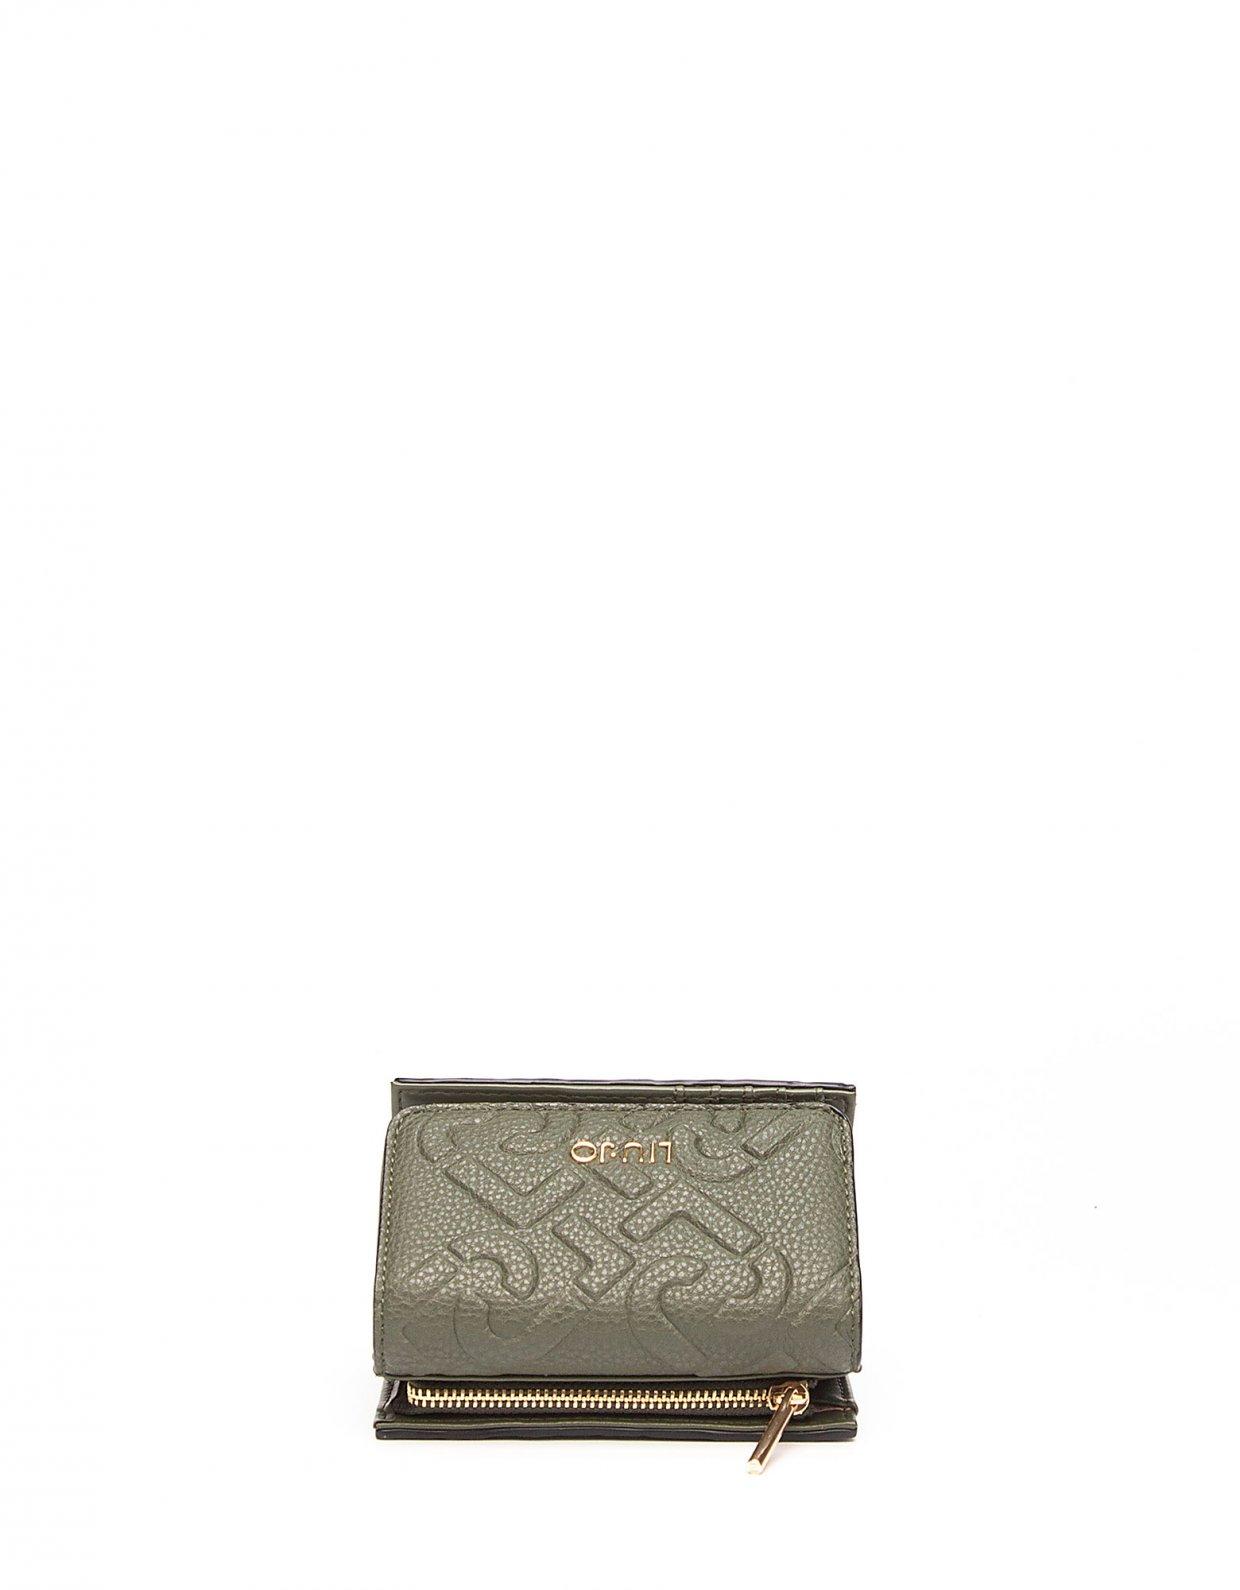 Liu Jo Wallet with logo dark olive